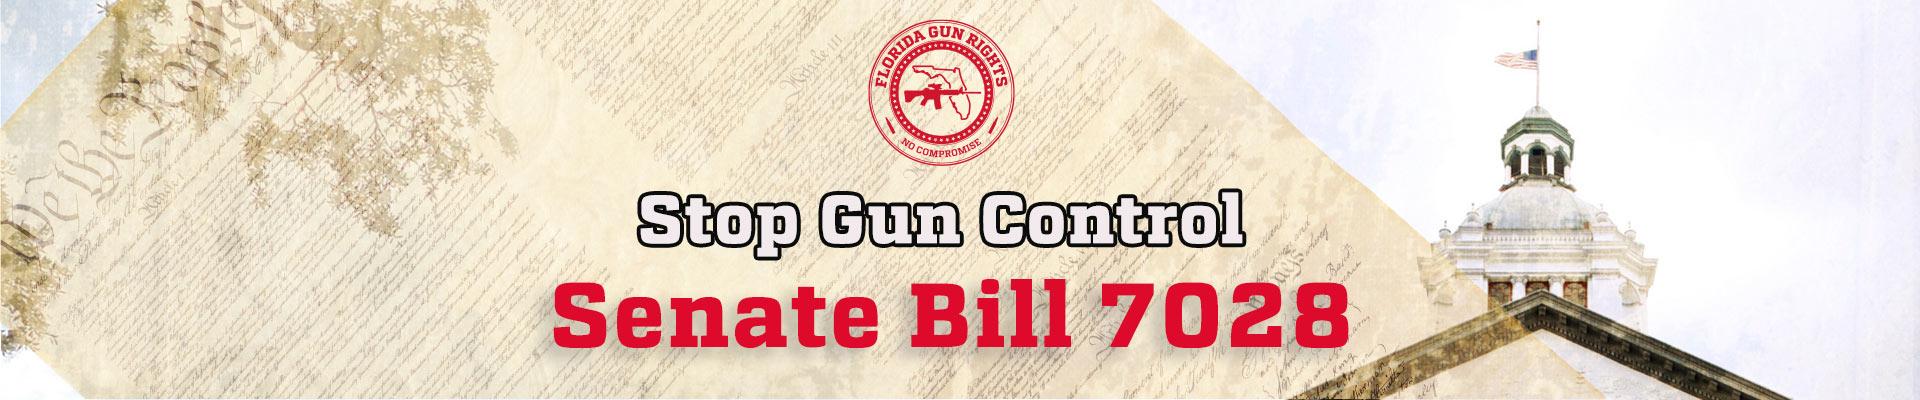 Stop Gun Control Senate Bill 7028